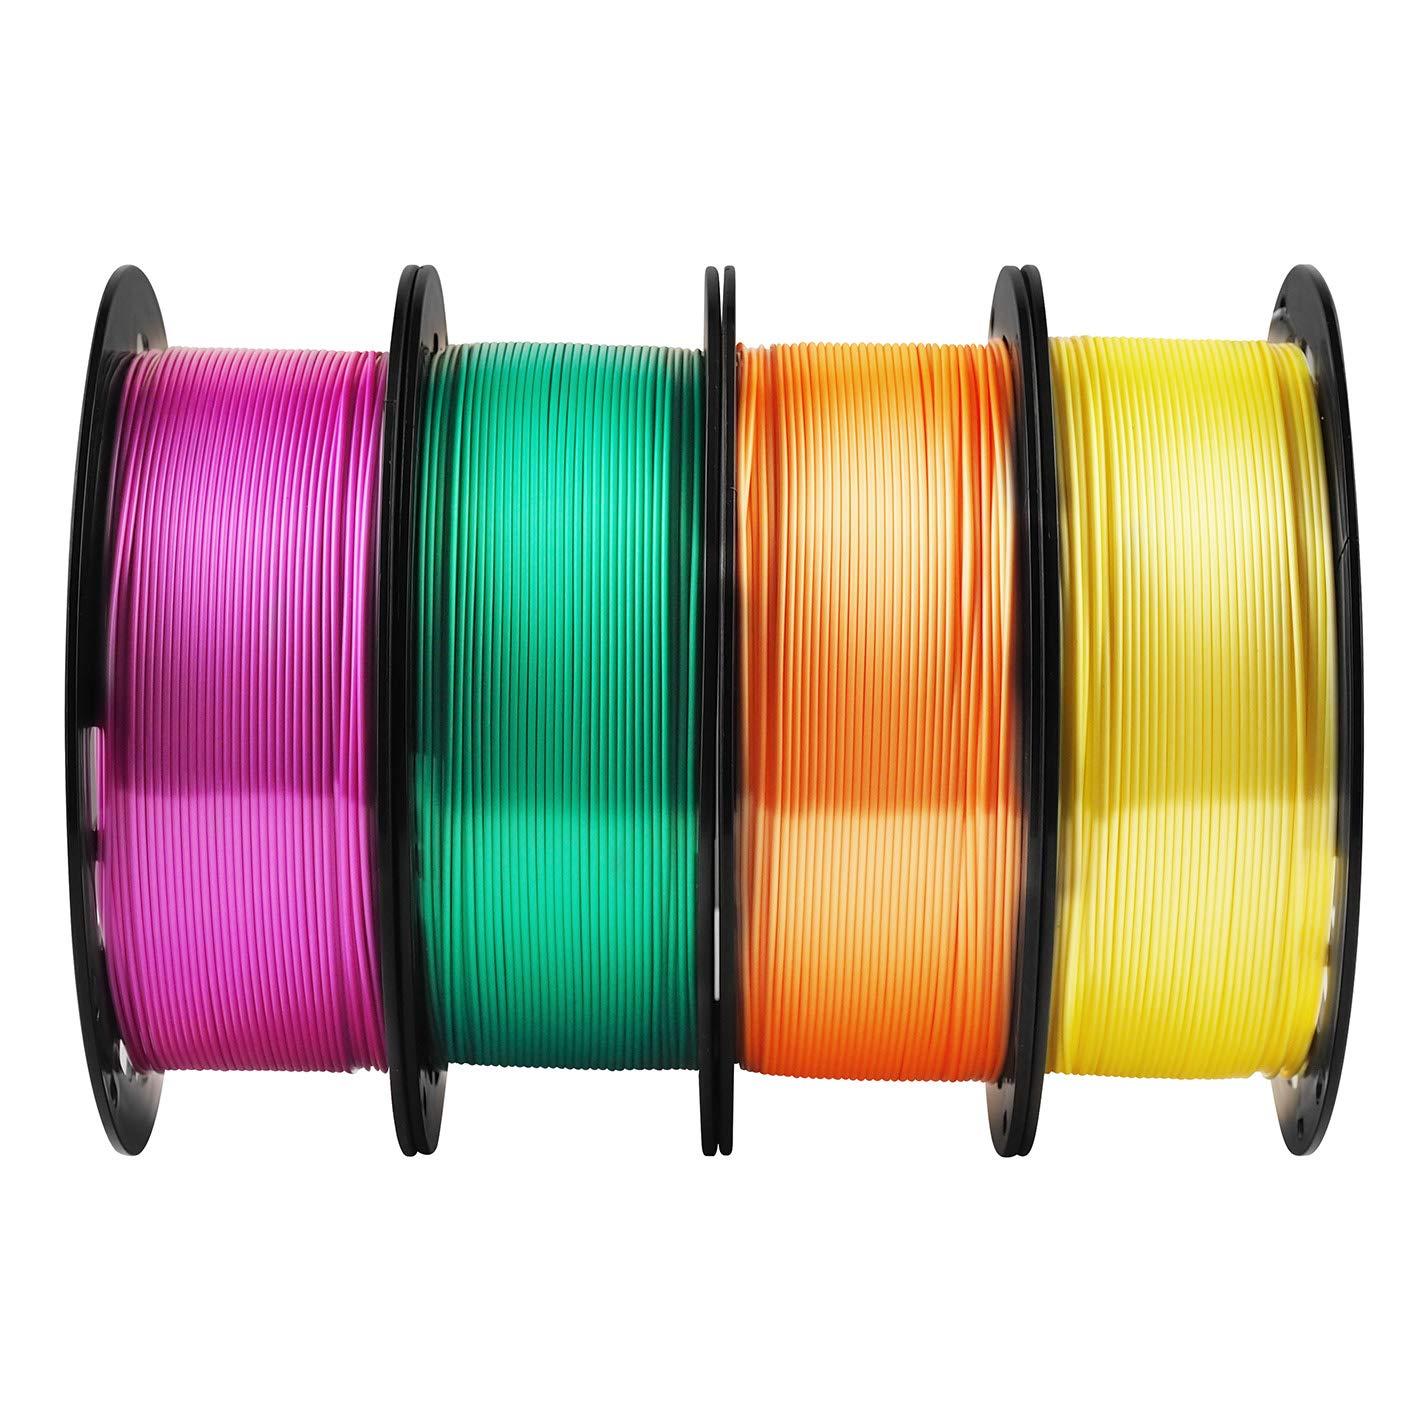 TTYT3D Paquete de filamento para impresora 3D PLA 4 en 1, amarillo ...